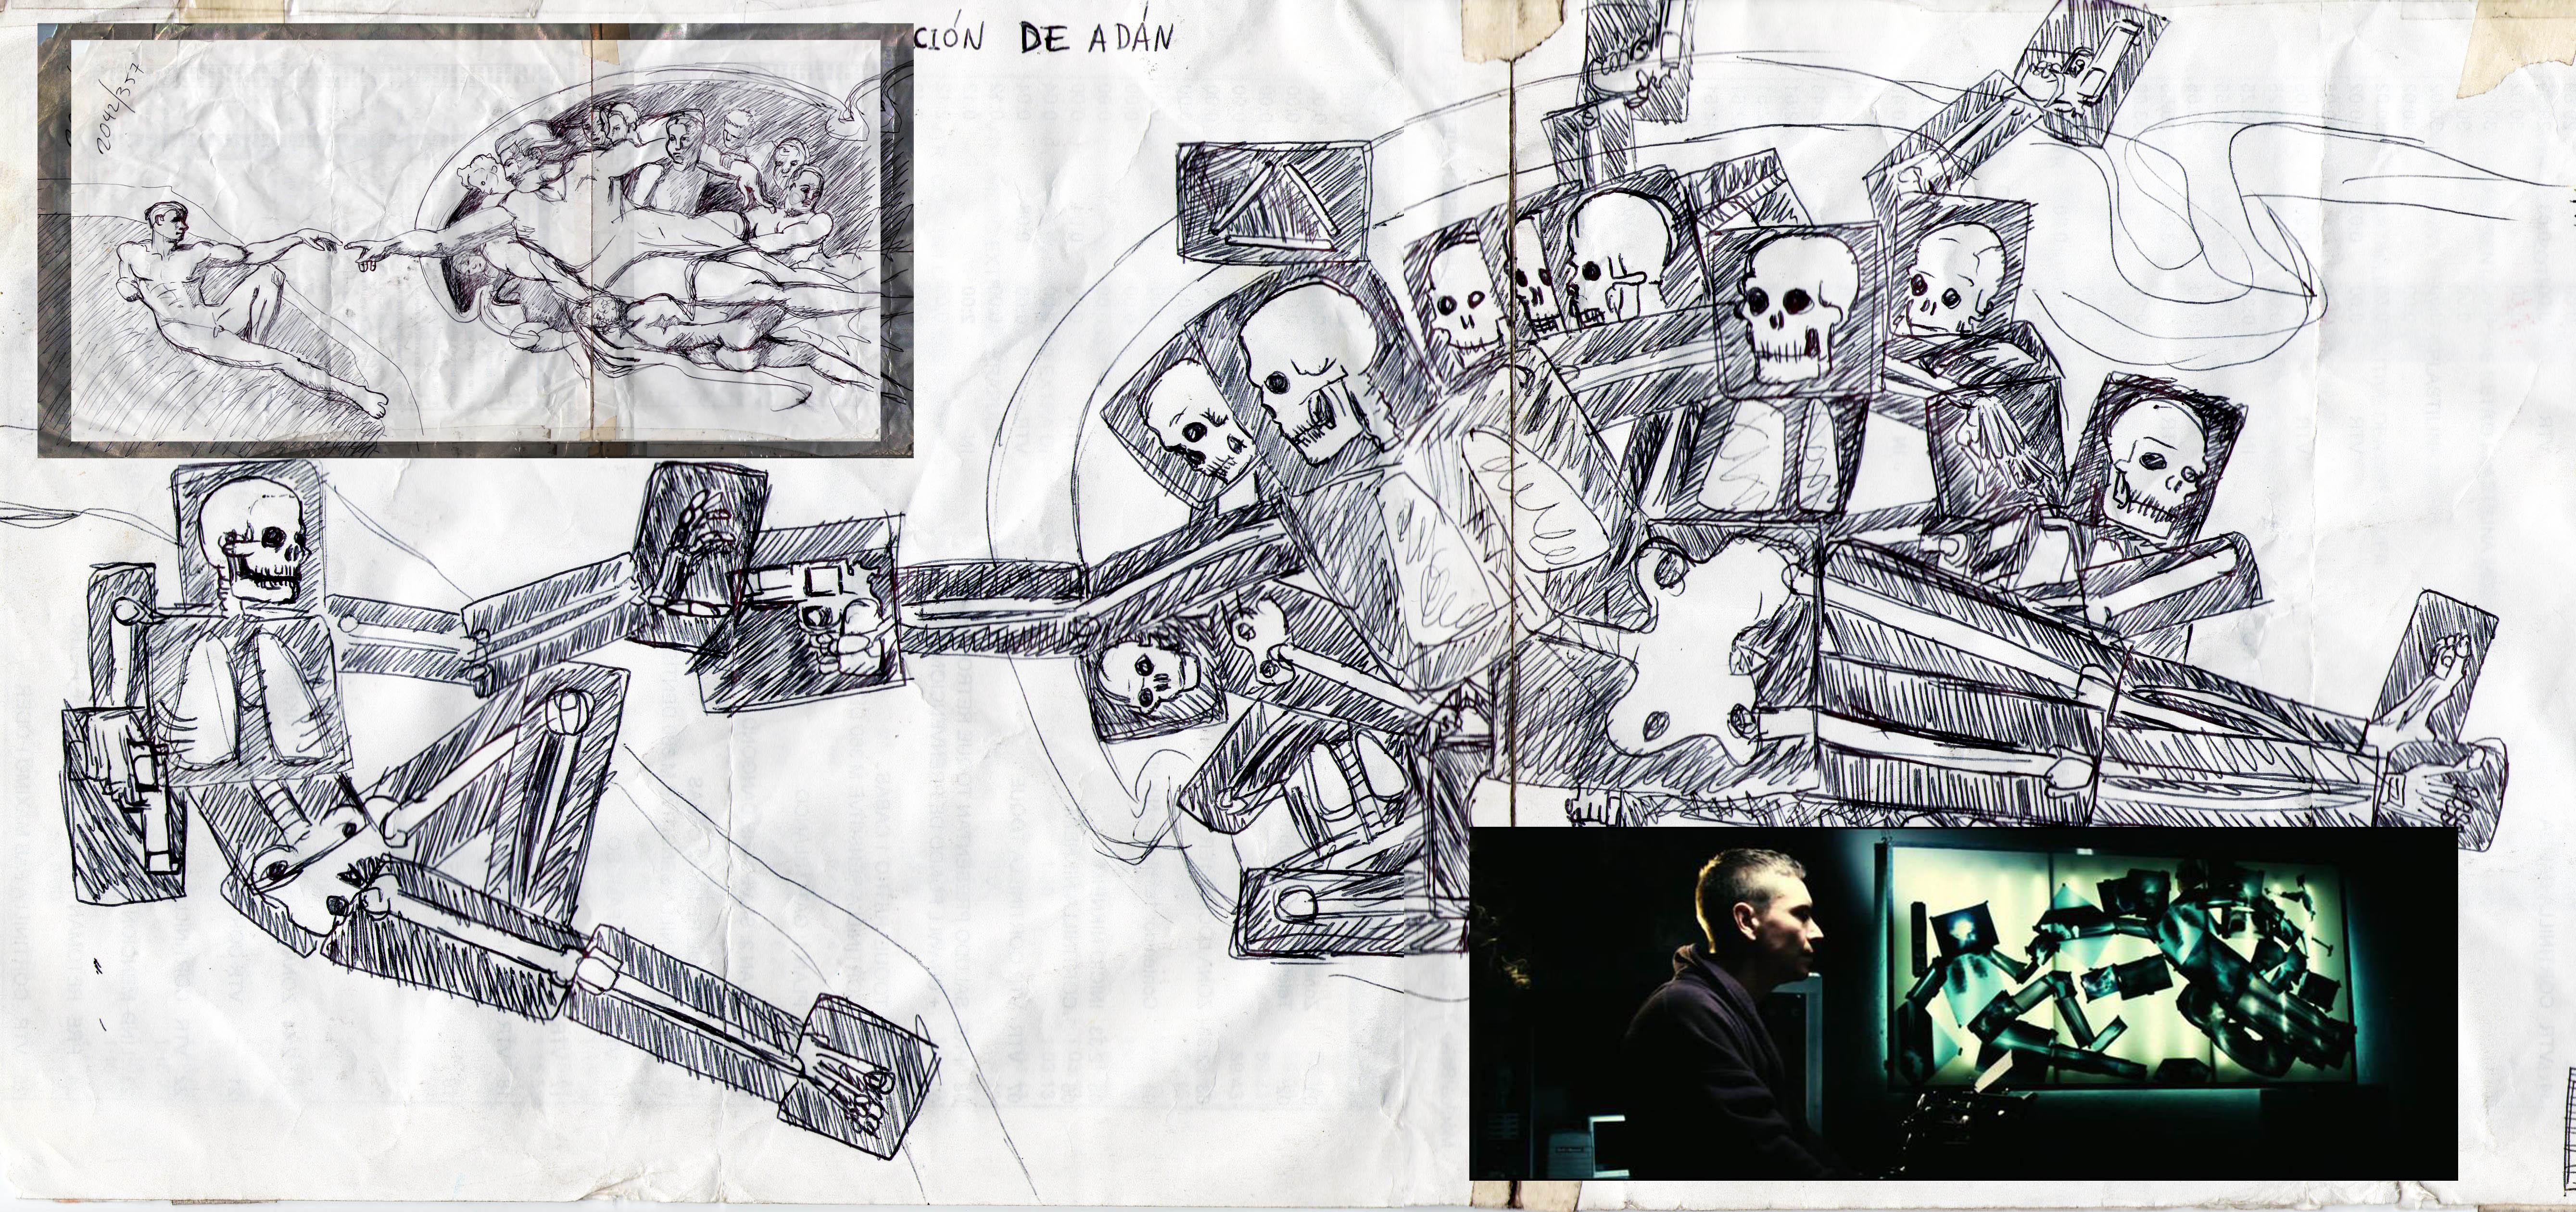 Destruction of Adam